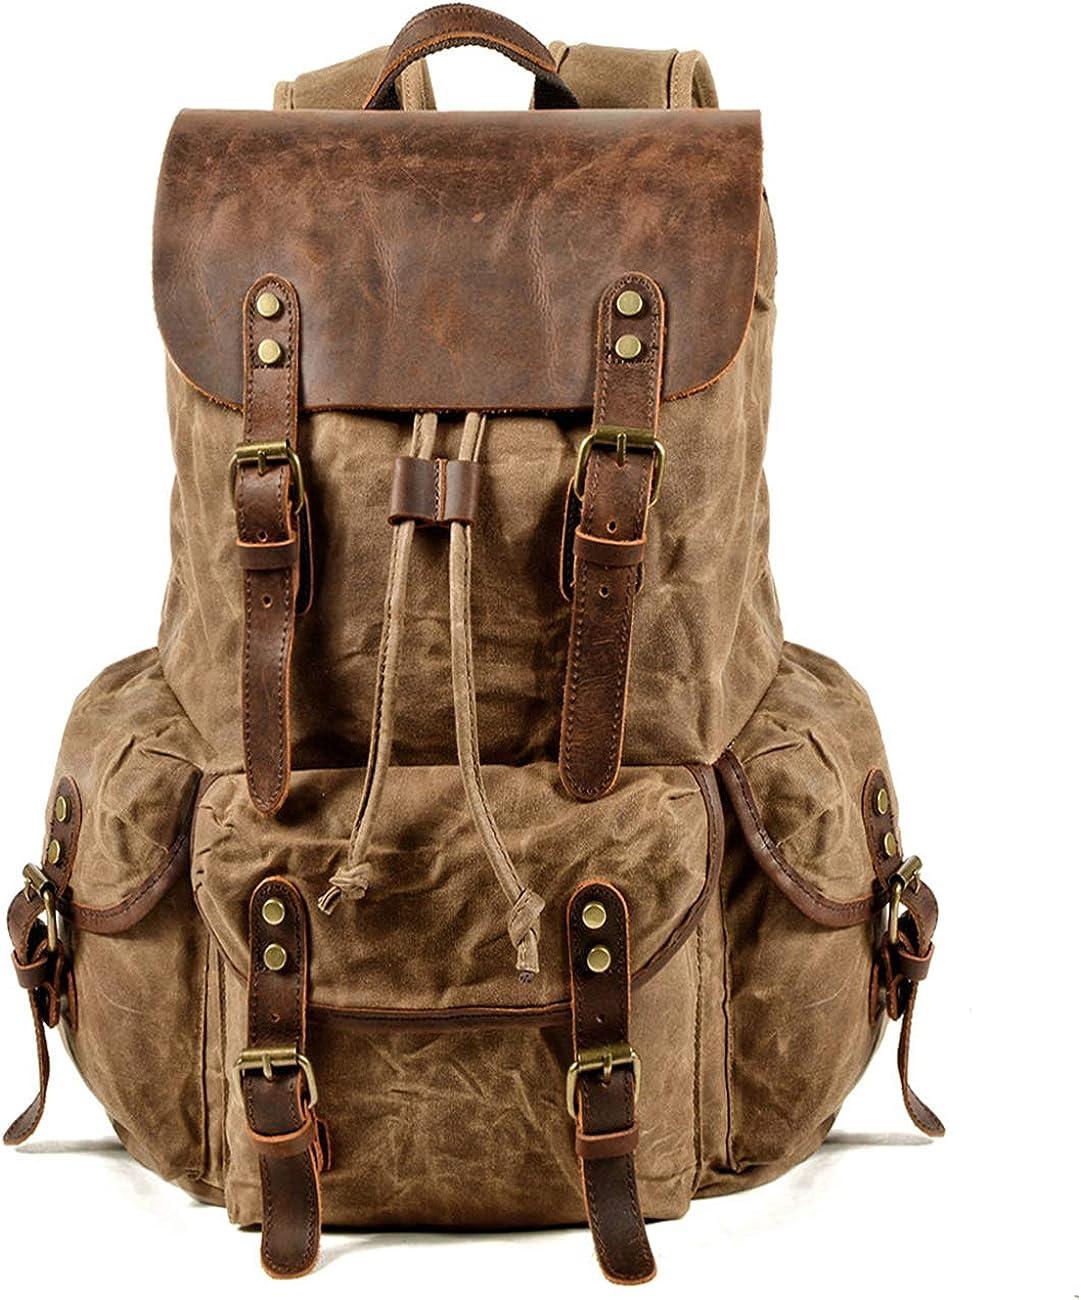 WUDON Leather Backpack for Men, Waxed Canvas Shoulder Rucksack for Travel School